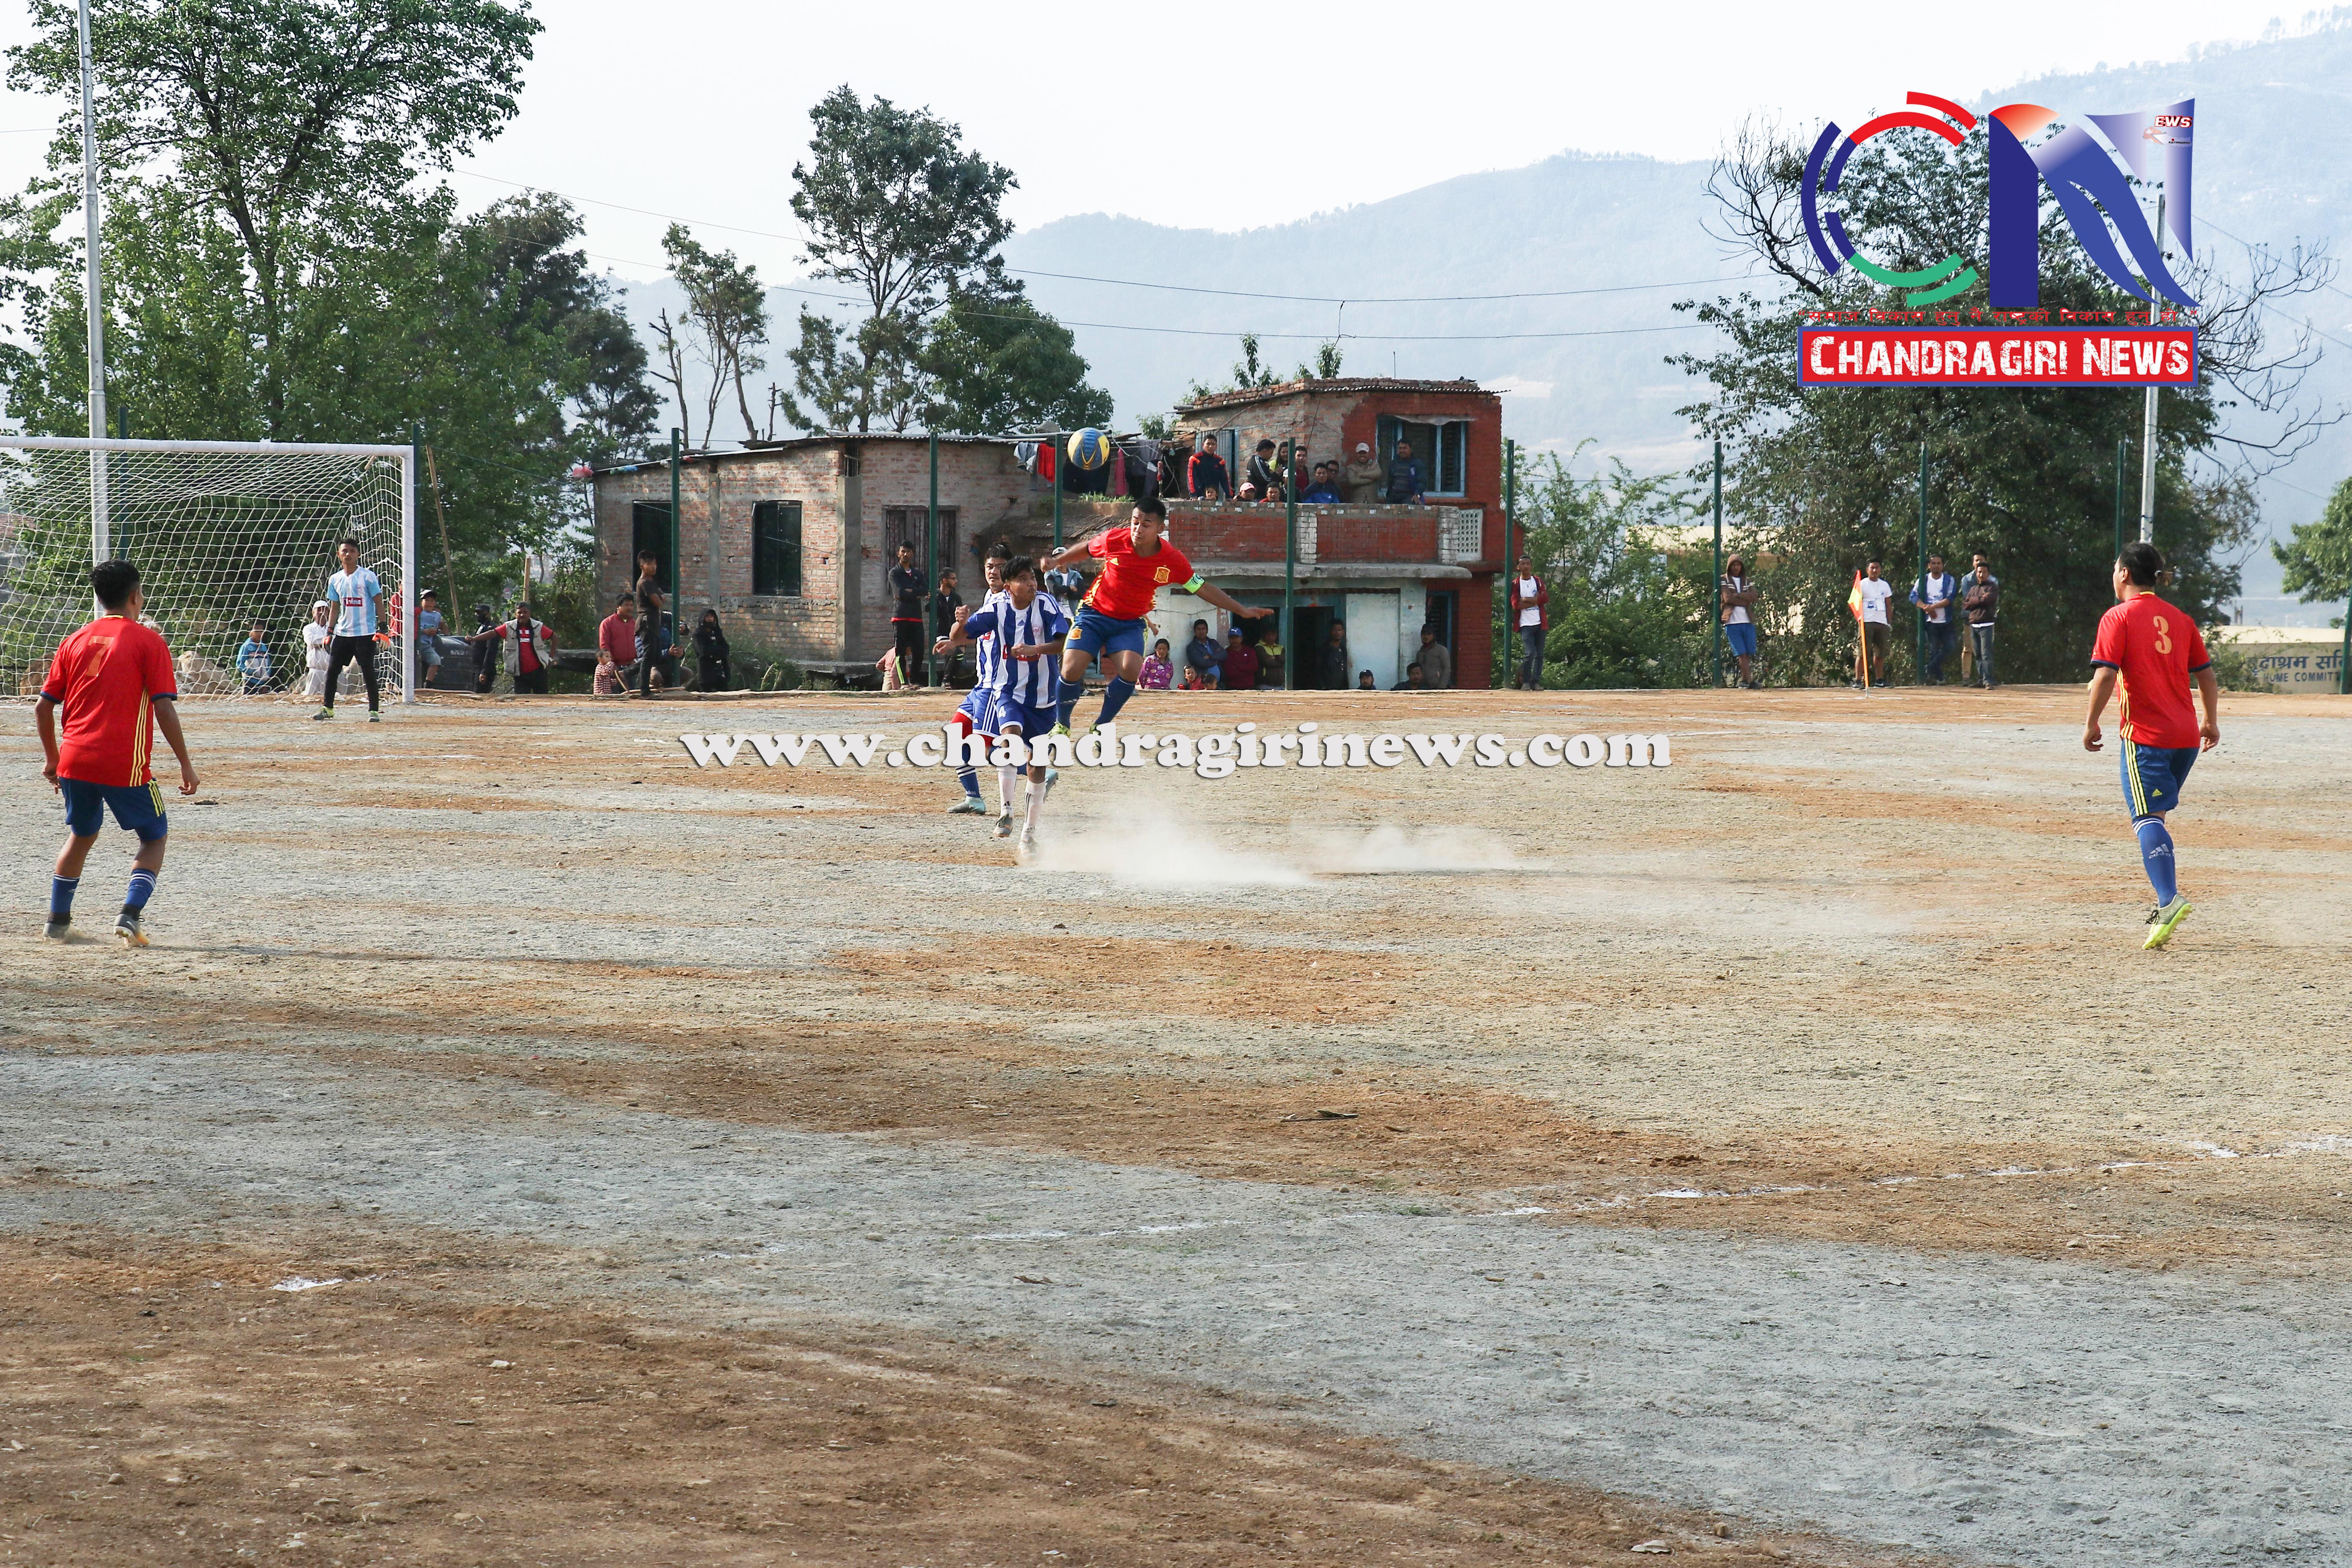 Chandragirinews western-united-first-game-10 चाैठाै  नेपाललय वईस्टन युनाईटेड क्लव फुटबल प्रतियाेगिता सुरू काठमाडौं किसीपिँडी खेलकुद थानकोट ब्रेकिंग न्युज महादेव स्थान मातातिर्थ मुख्य    chandragiri